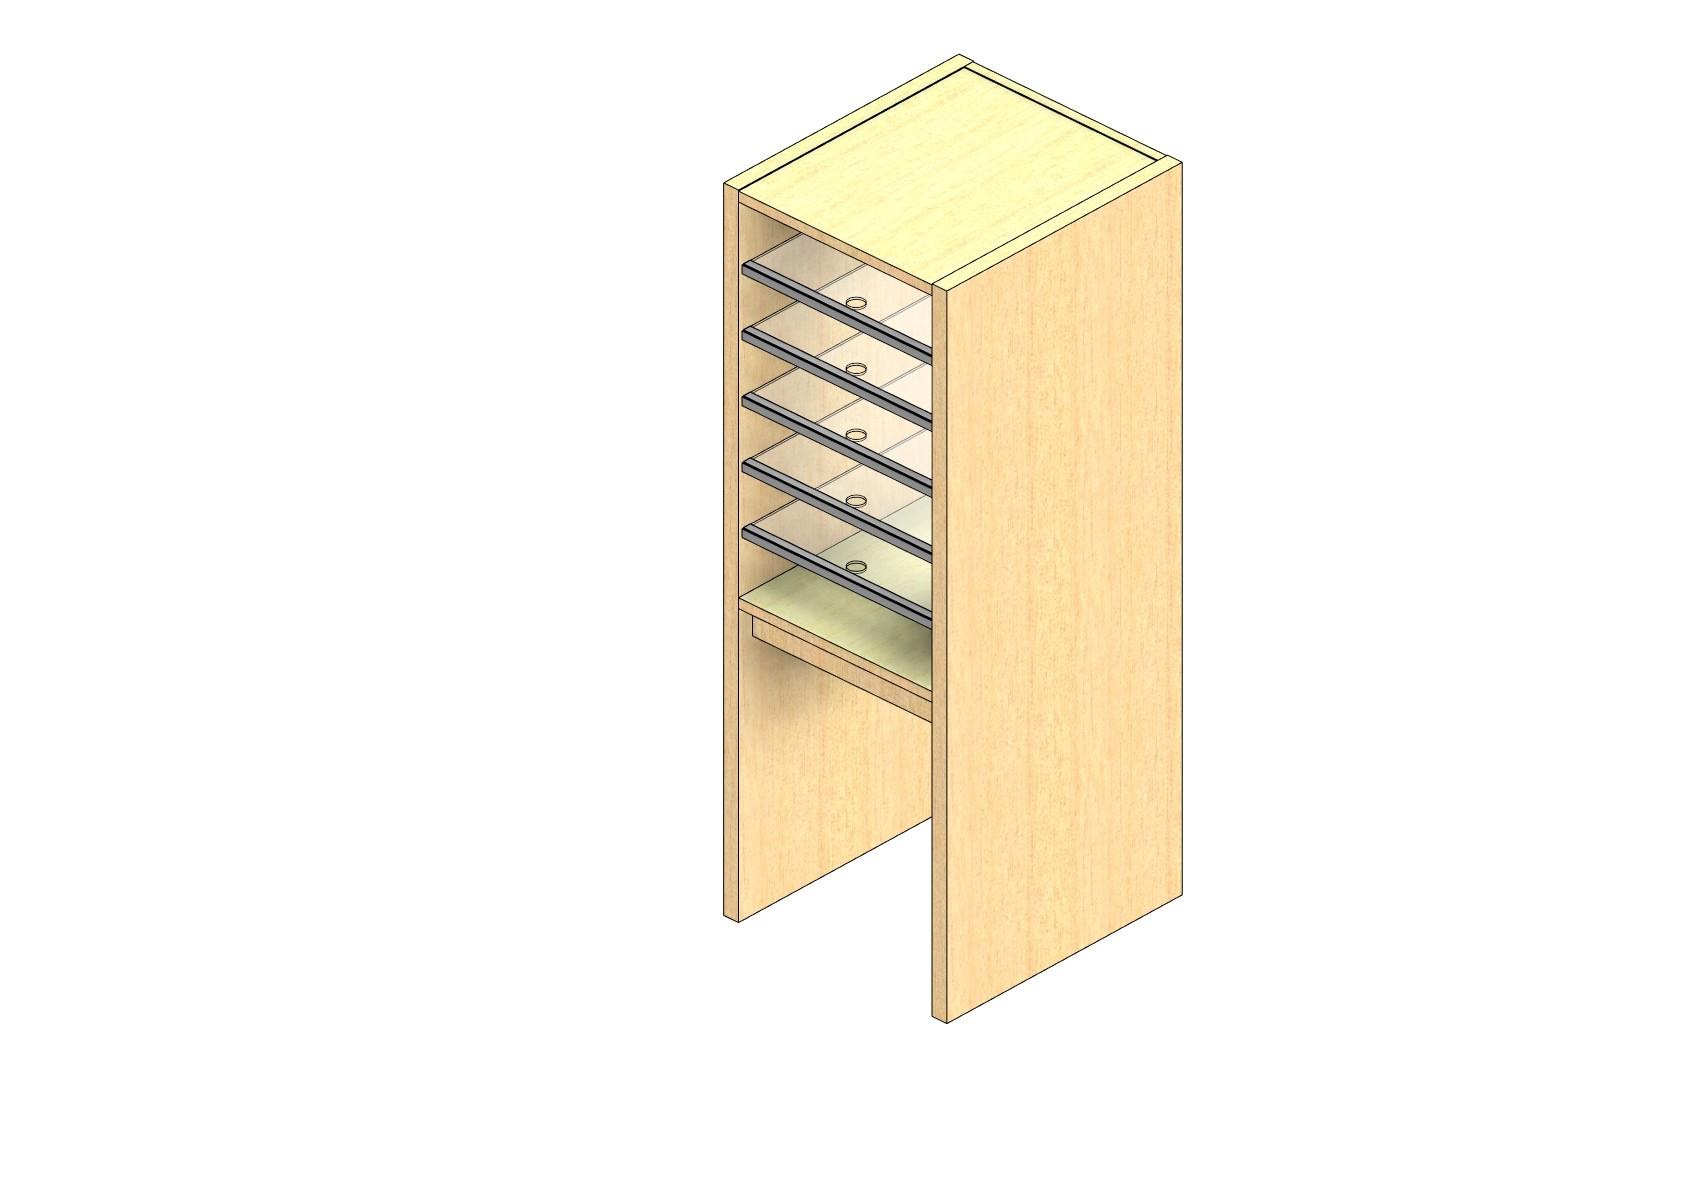 "Oversize Sized Closed Back Sort Module - 1 Column - 24"" Sorting Height w/ 18"" Riser"